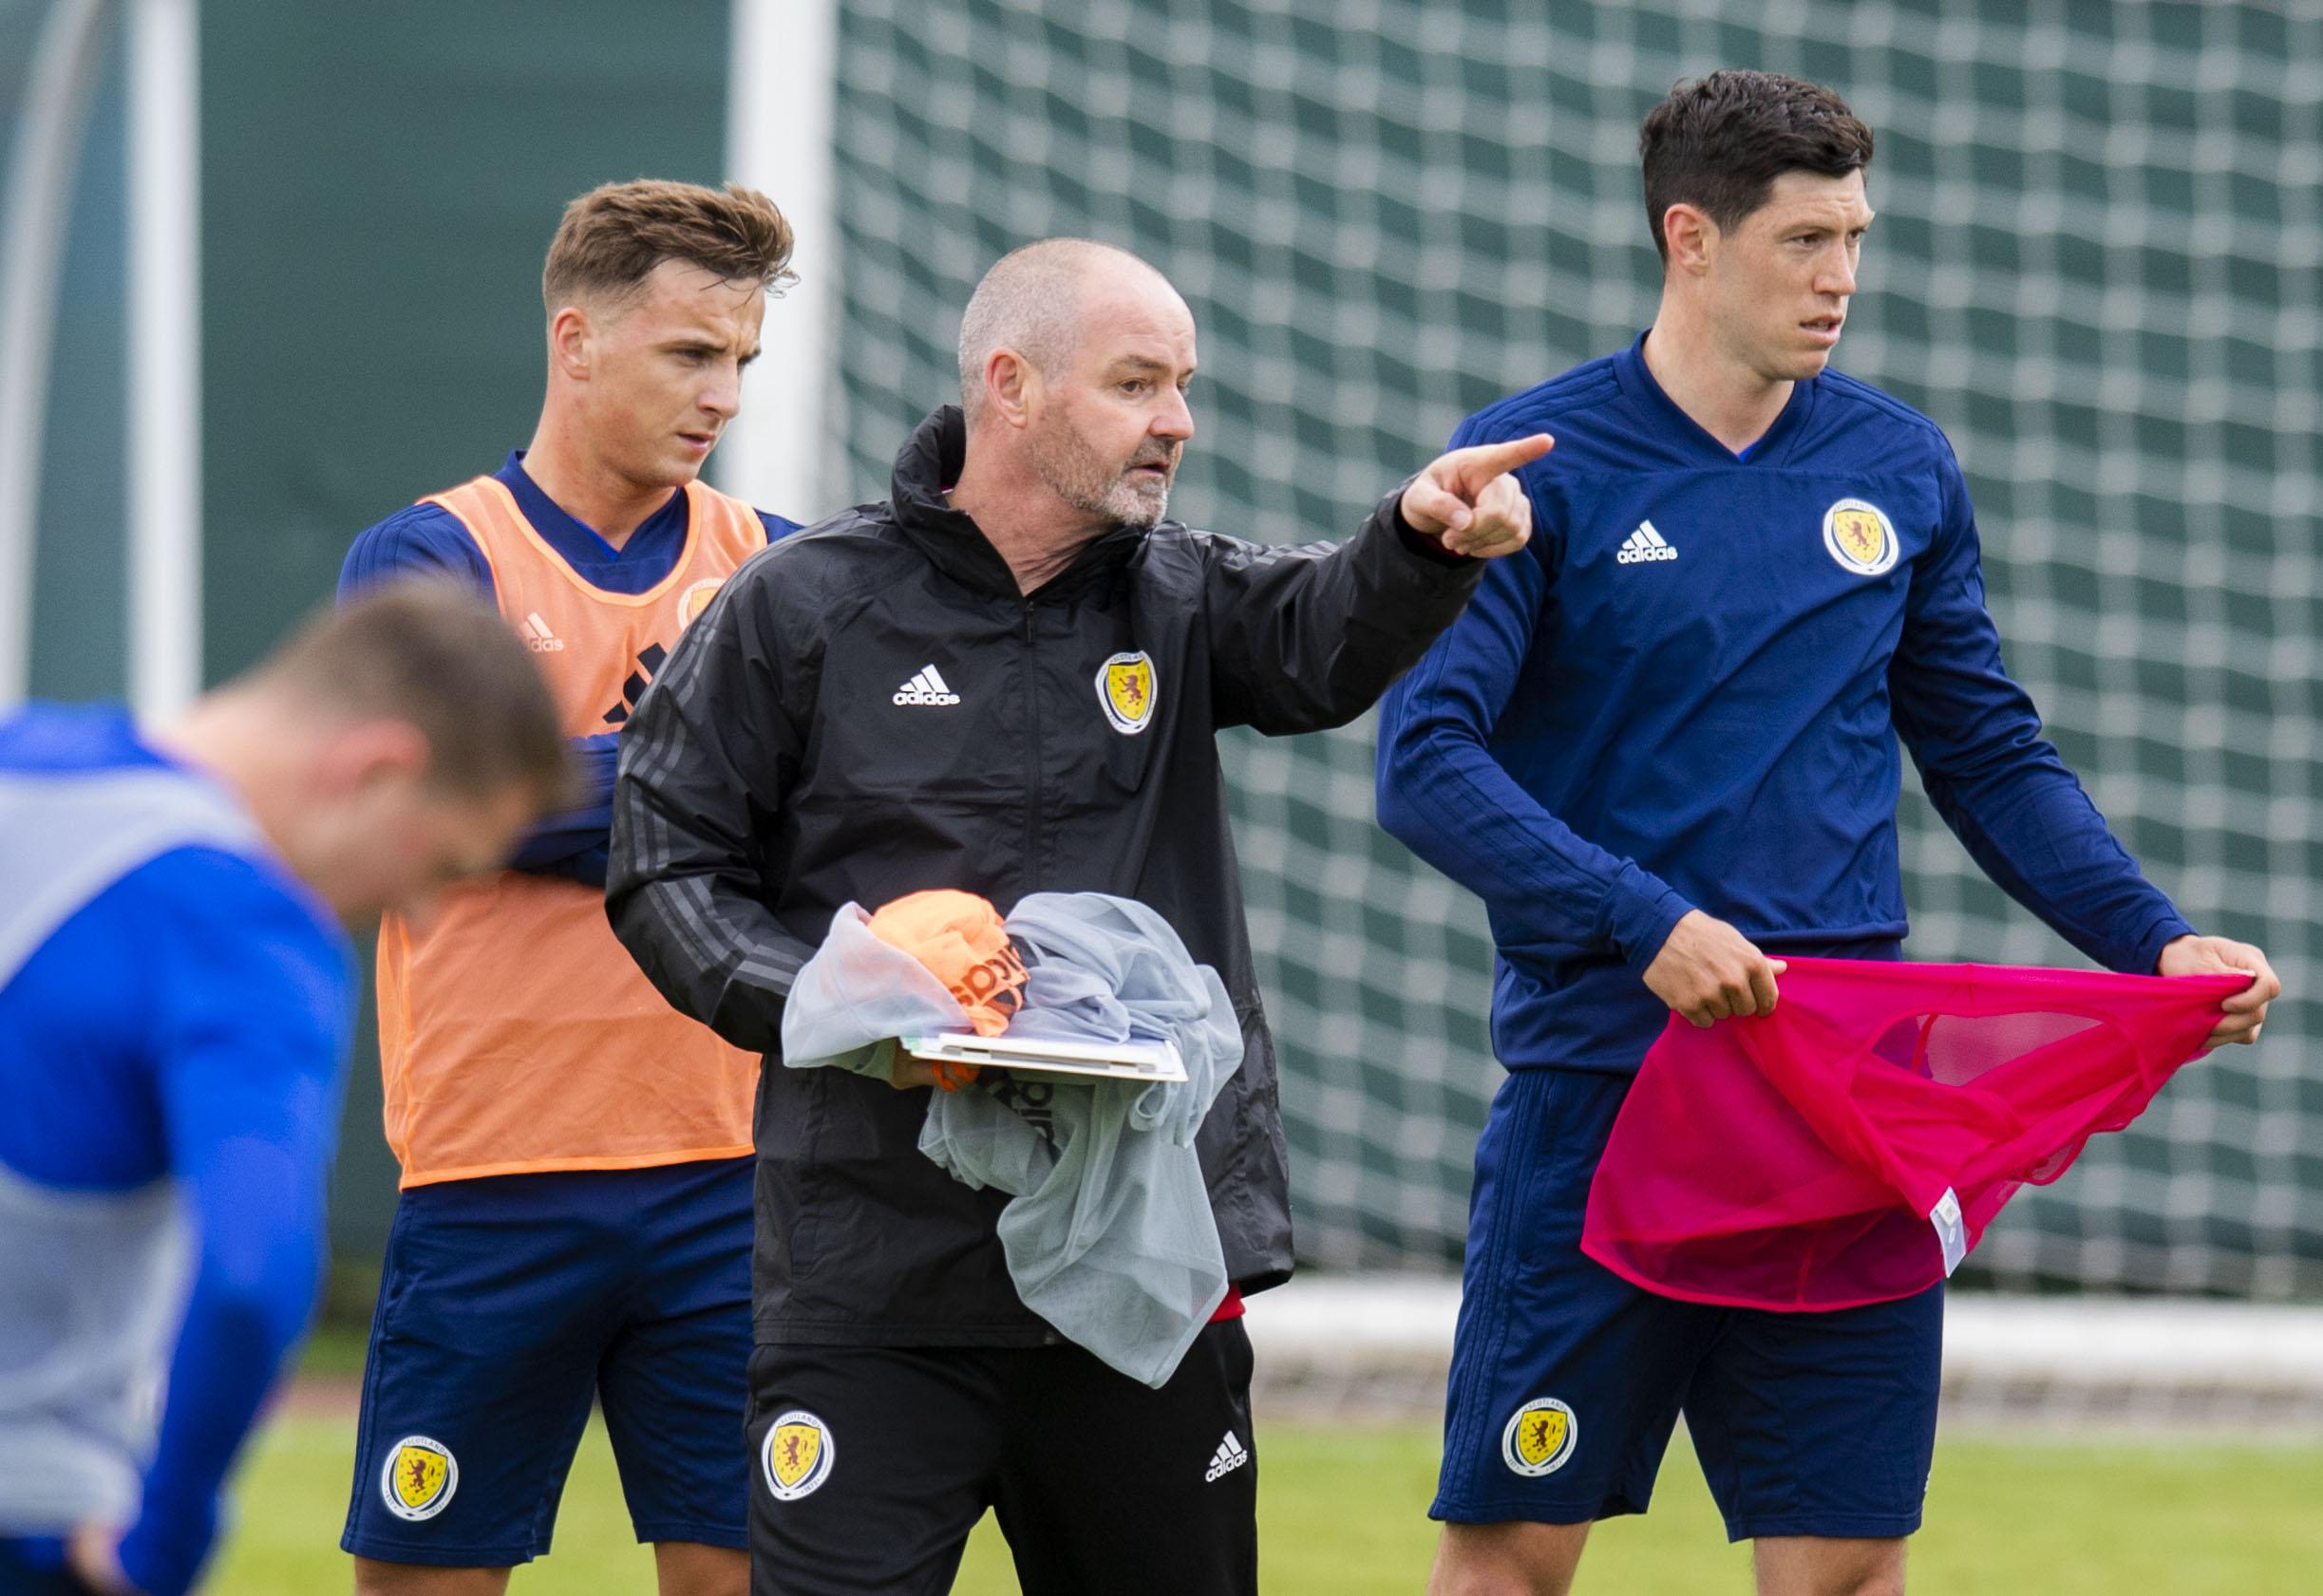 Scotland manager Steve Clarke speaks with Scott McKenna during training for a recent international